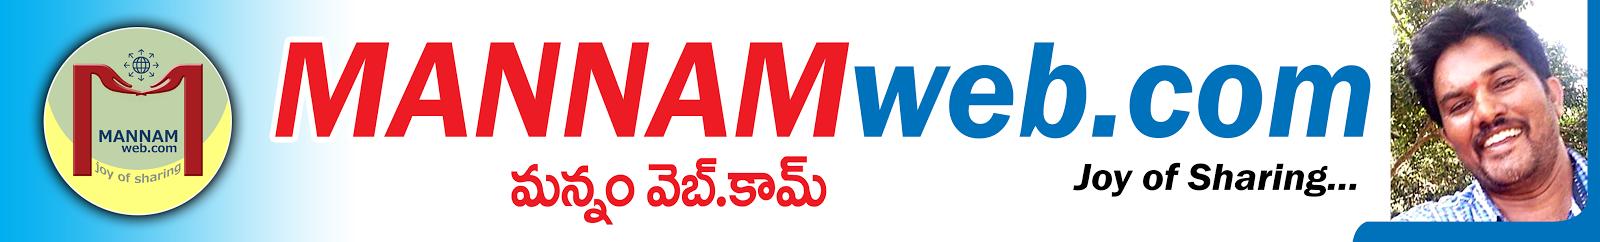 MANNAMweb.com